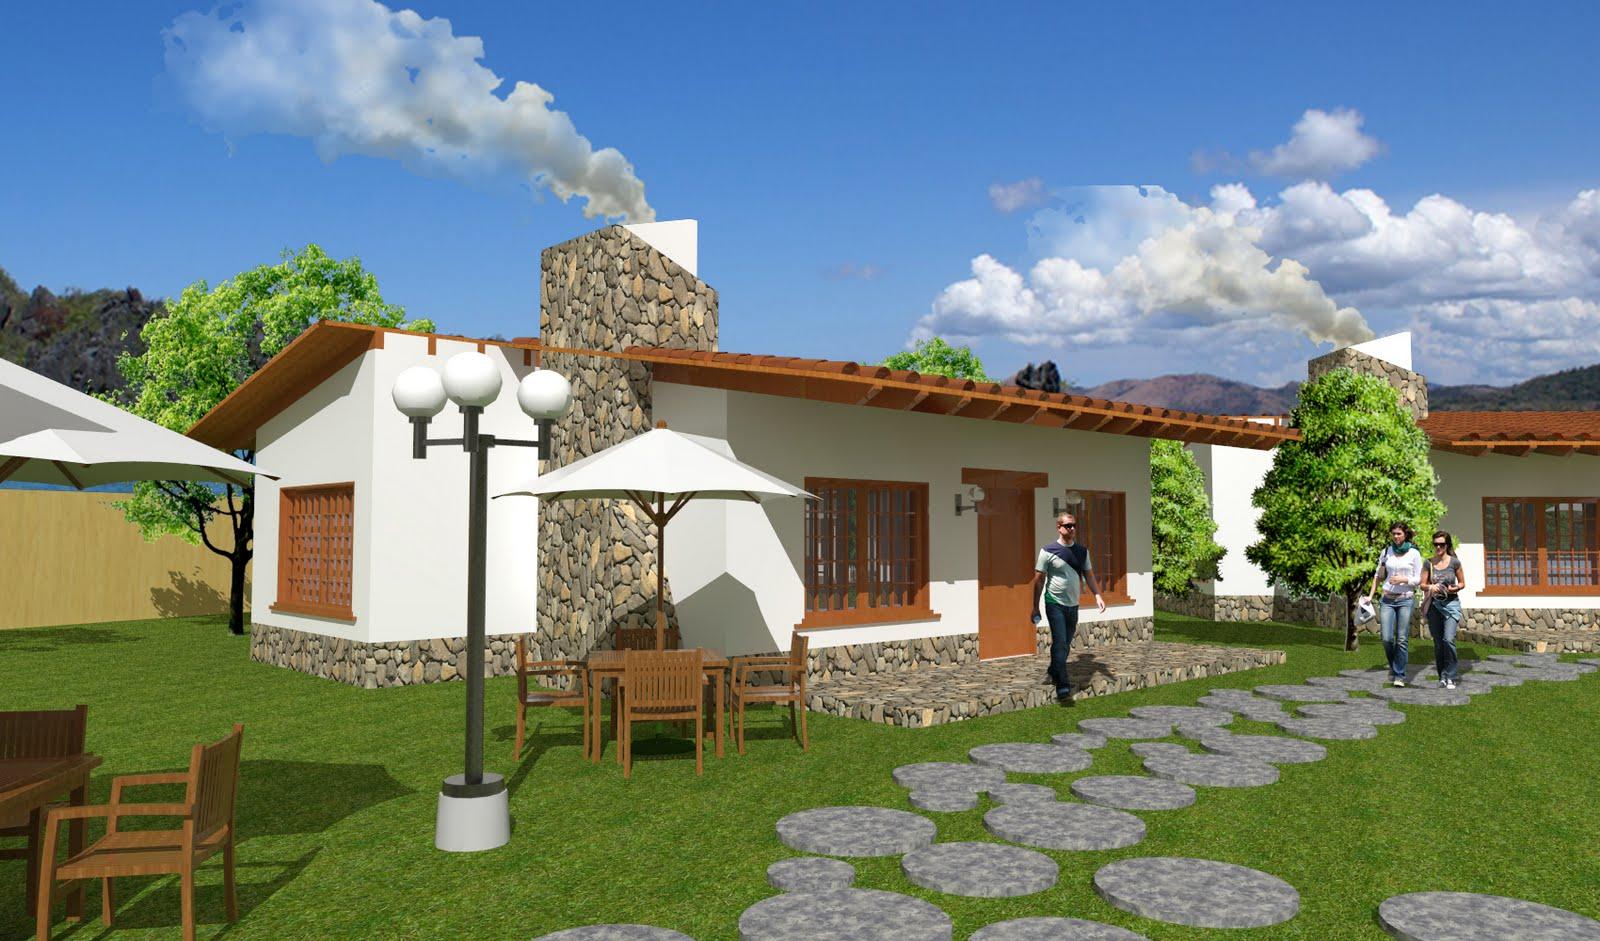 Arquitectura 3d arquitectura casa de playa chilca peru for Programas de arquitectura 3d